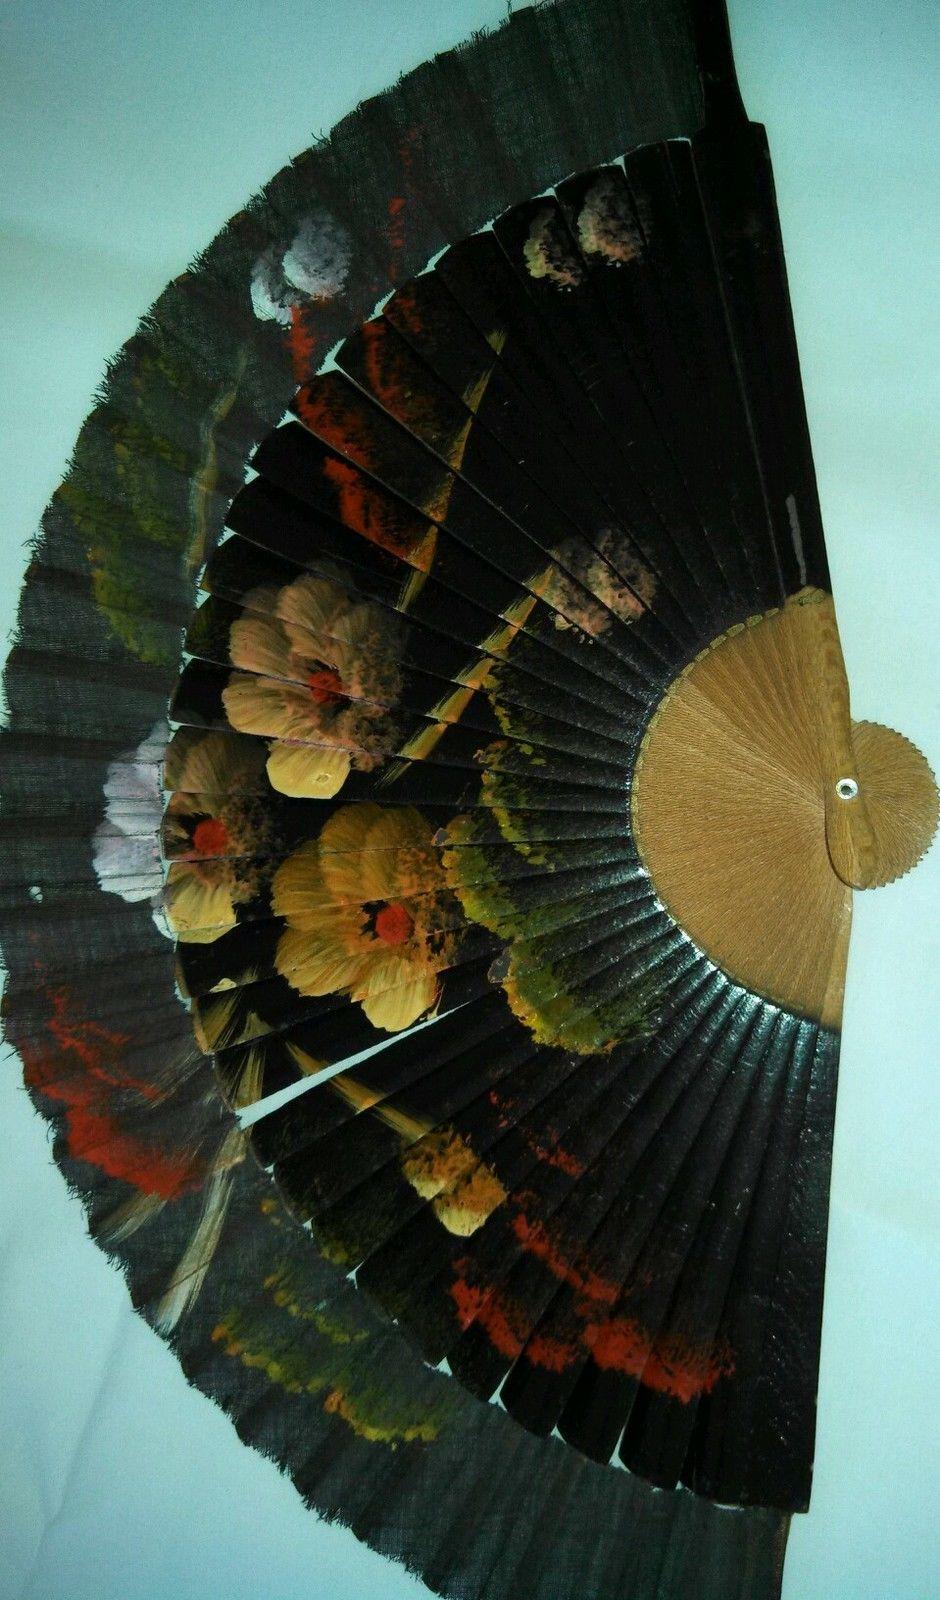 Hand Painted Hand Fan,,,,,,,,,,,,,http://www.pinterest.com/pluengolinares/ol%C3%A9-ol%C3%A9-y-ol%C3%A9/